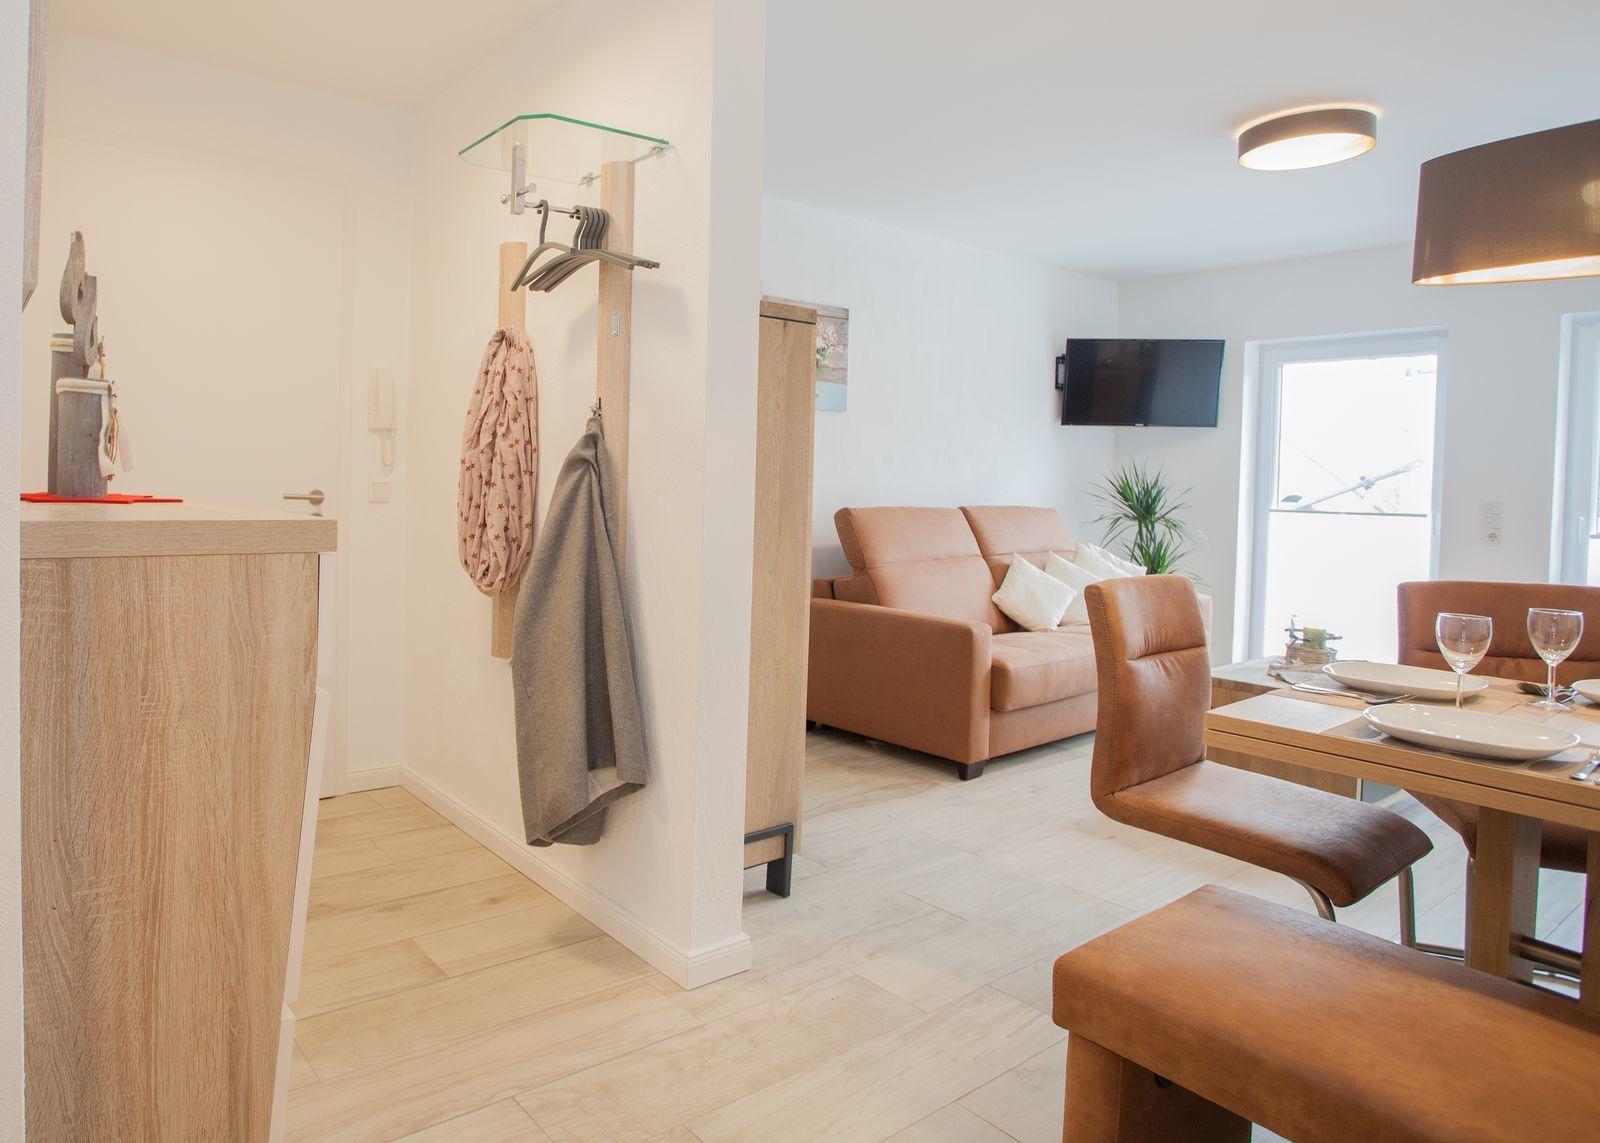 Appartement - Kappenblick 2 (Buchenweg)